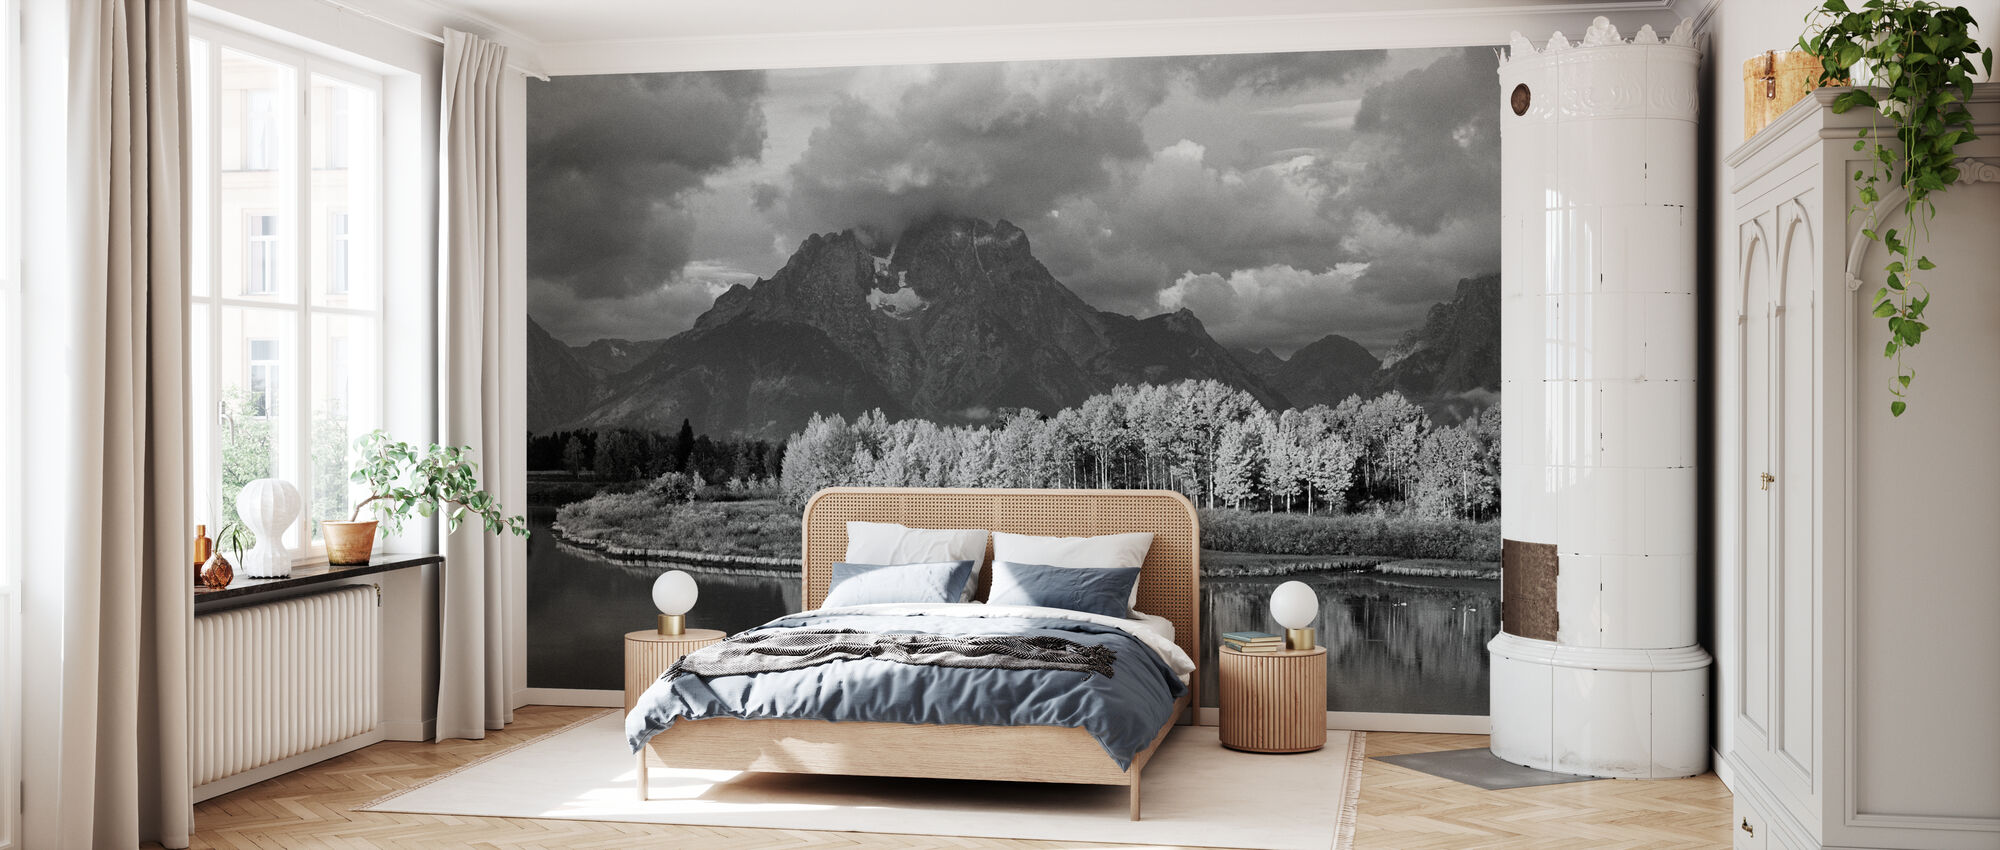 Grand Teton - b/w - Wallpaper - Bedroom